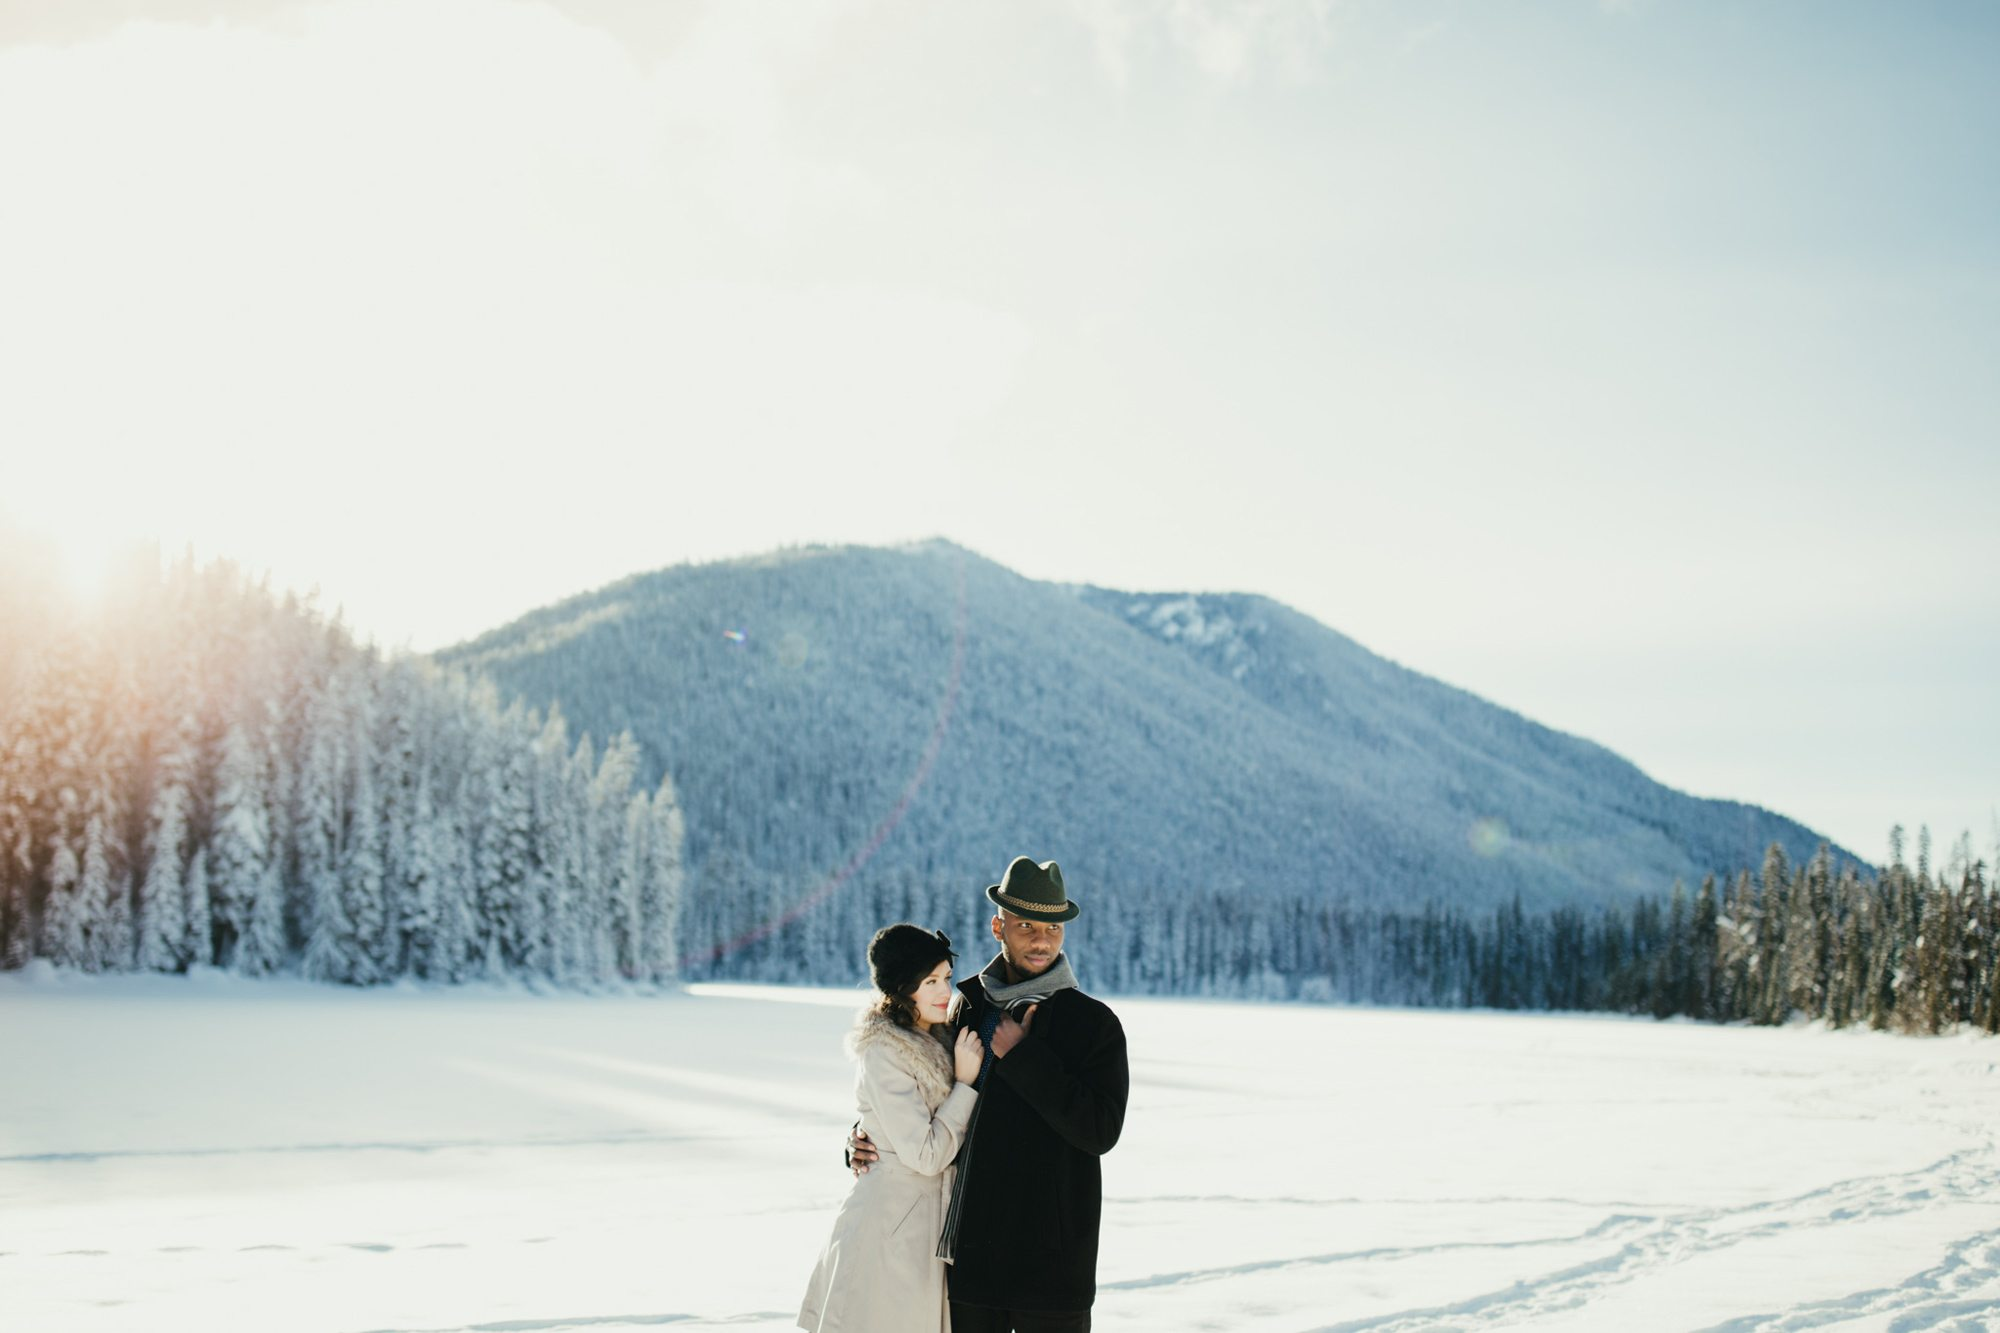 020-adventure-engagement-photographer